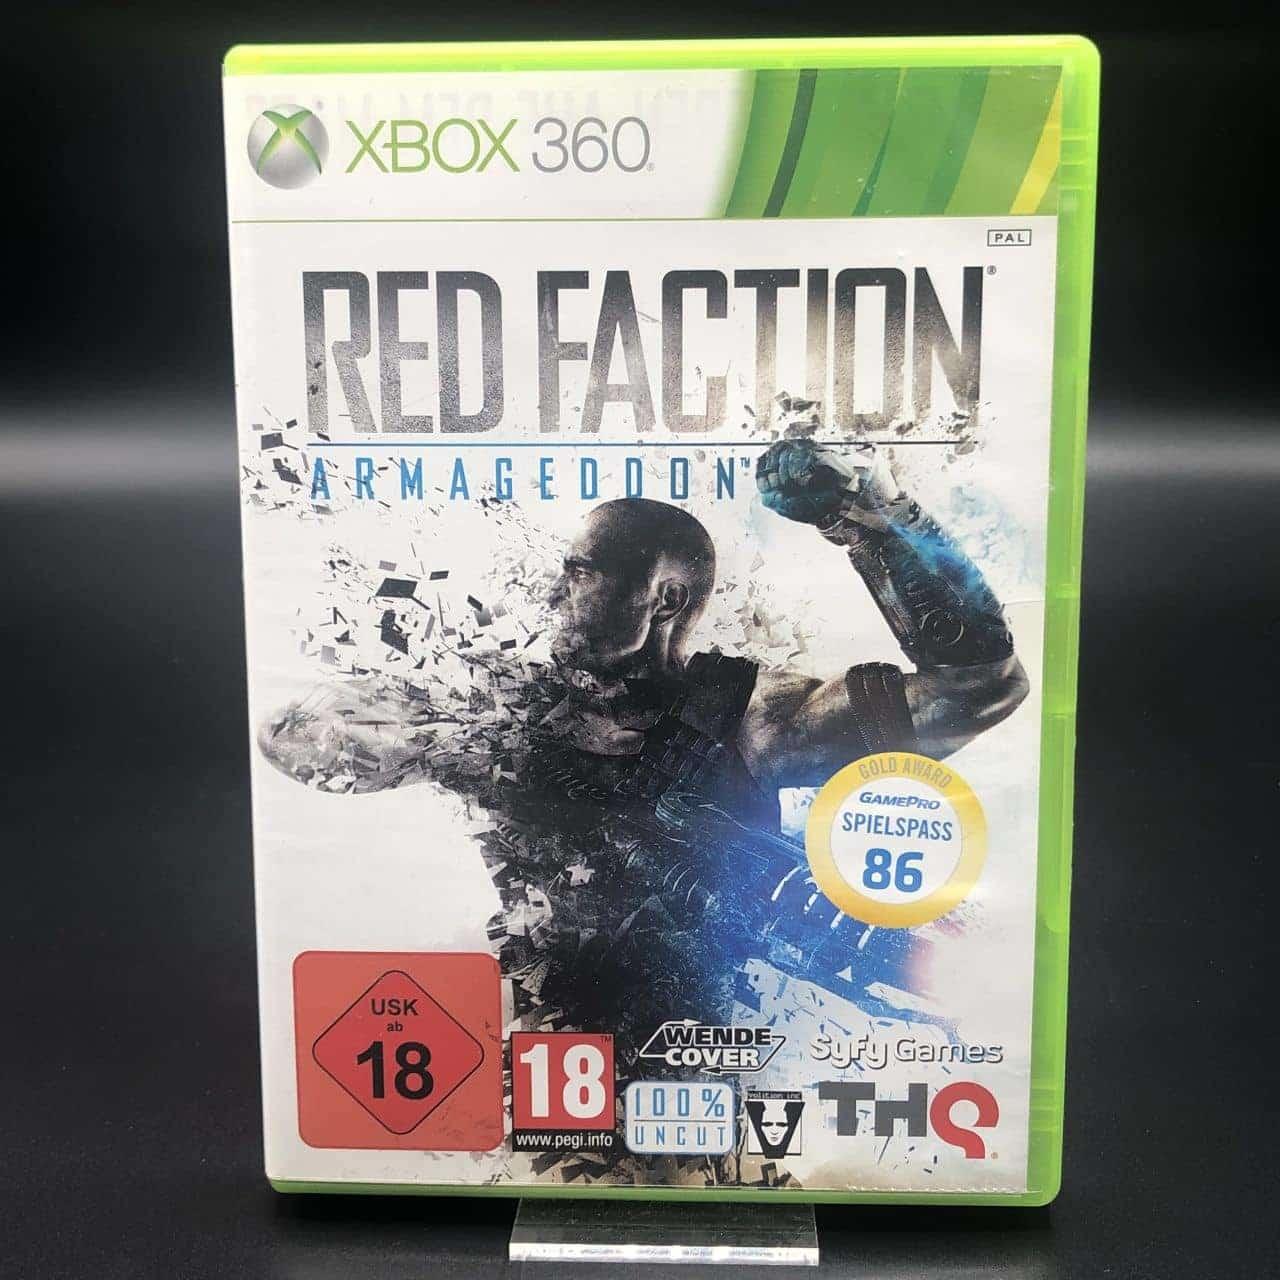 Red Faction: Armageddon (Komplett) (Sehr gut) XBOX 360 (FSK18)